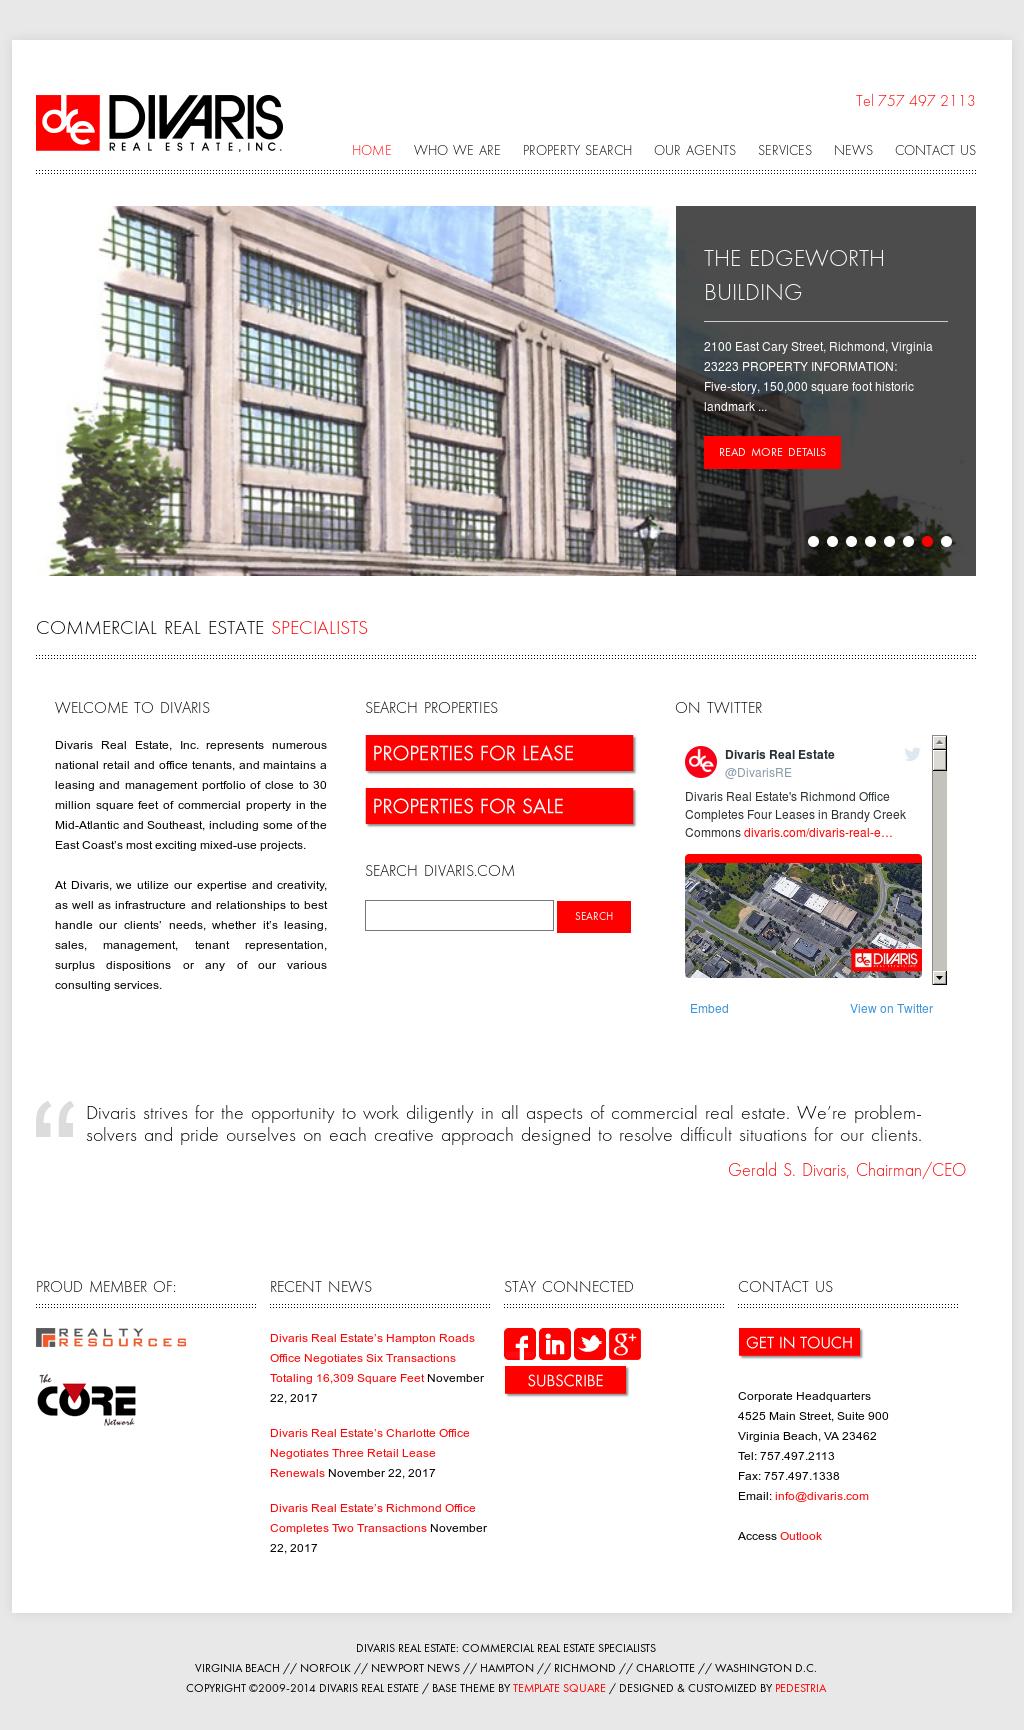 Divaris Real Estate Competitors, Revenue and Employees